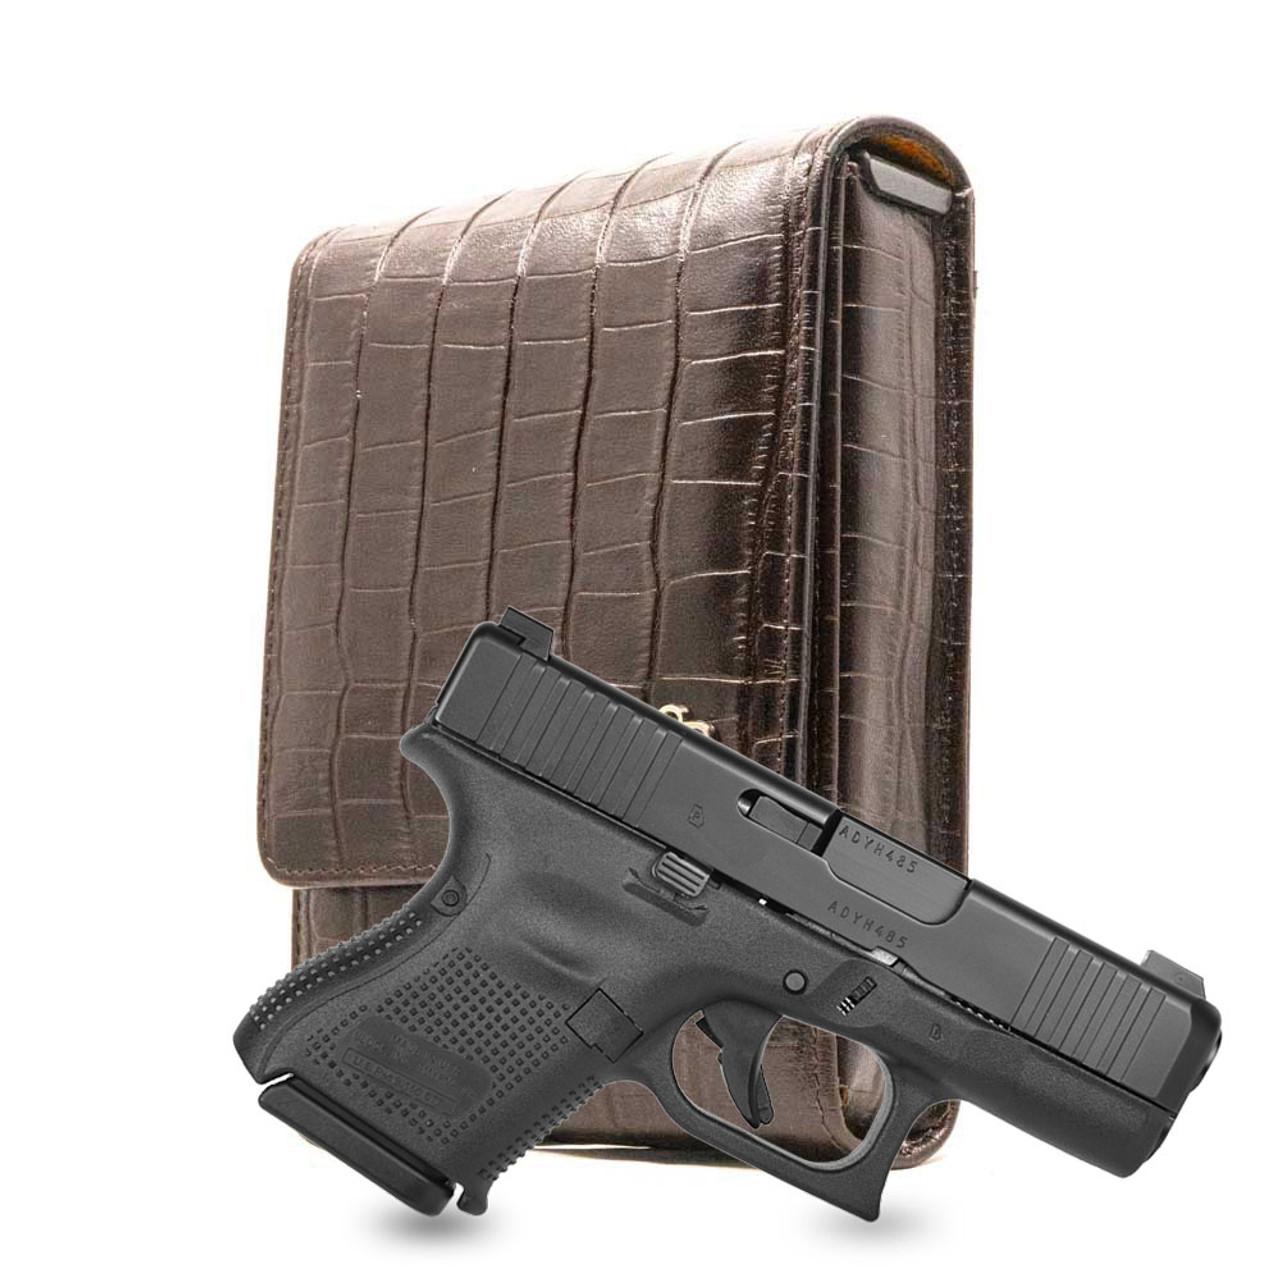 Glock 26 Brown Alligator Series Holster